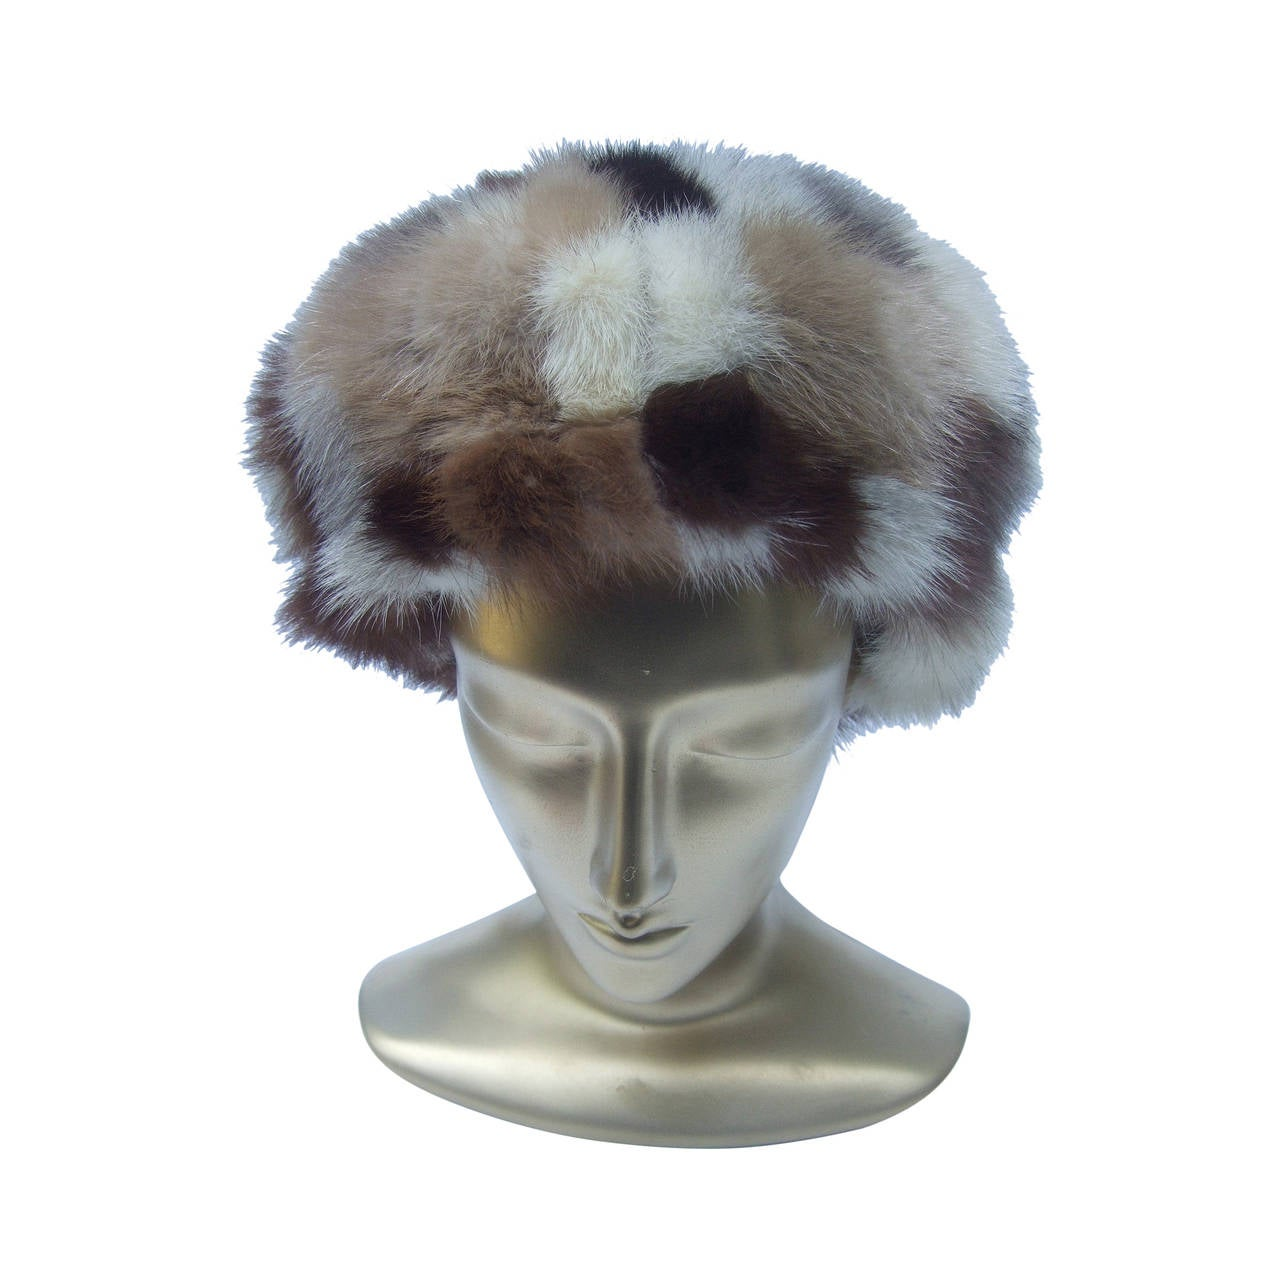 Saks Fifth Avenue Mink Patch Tile Hat c 1970 For Sale